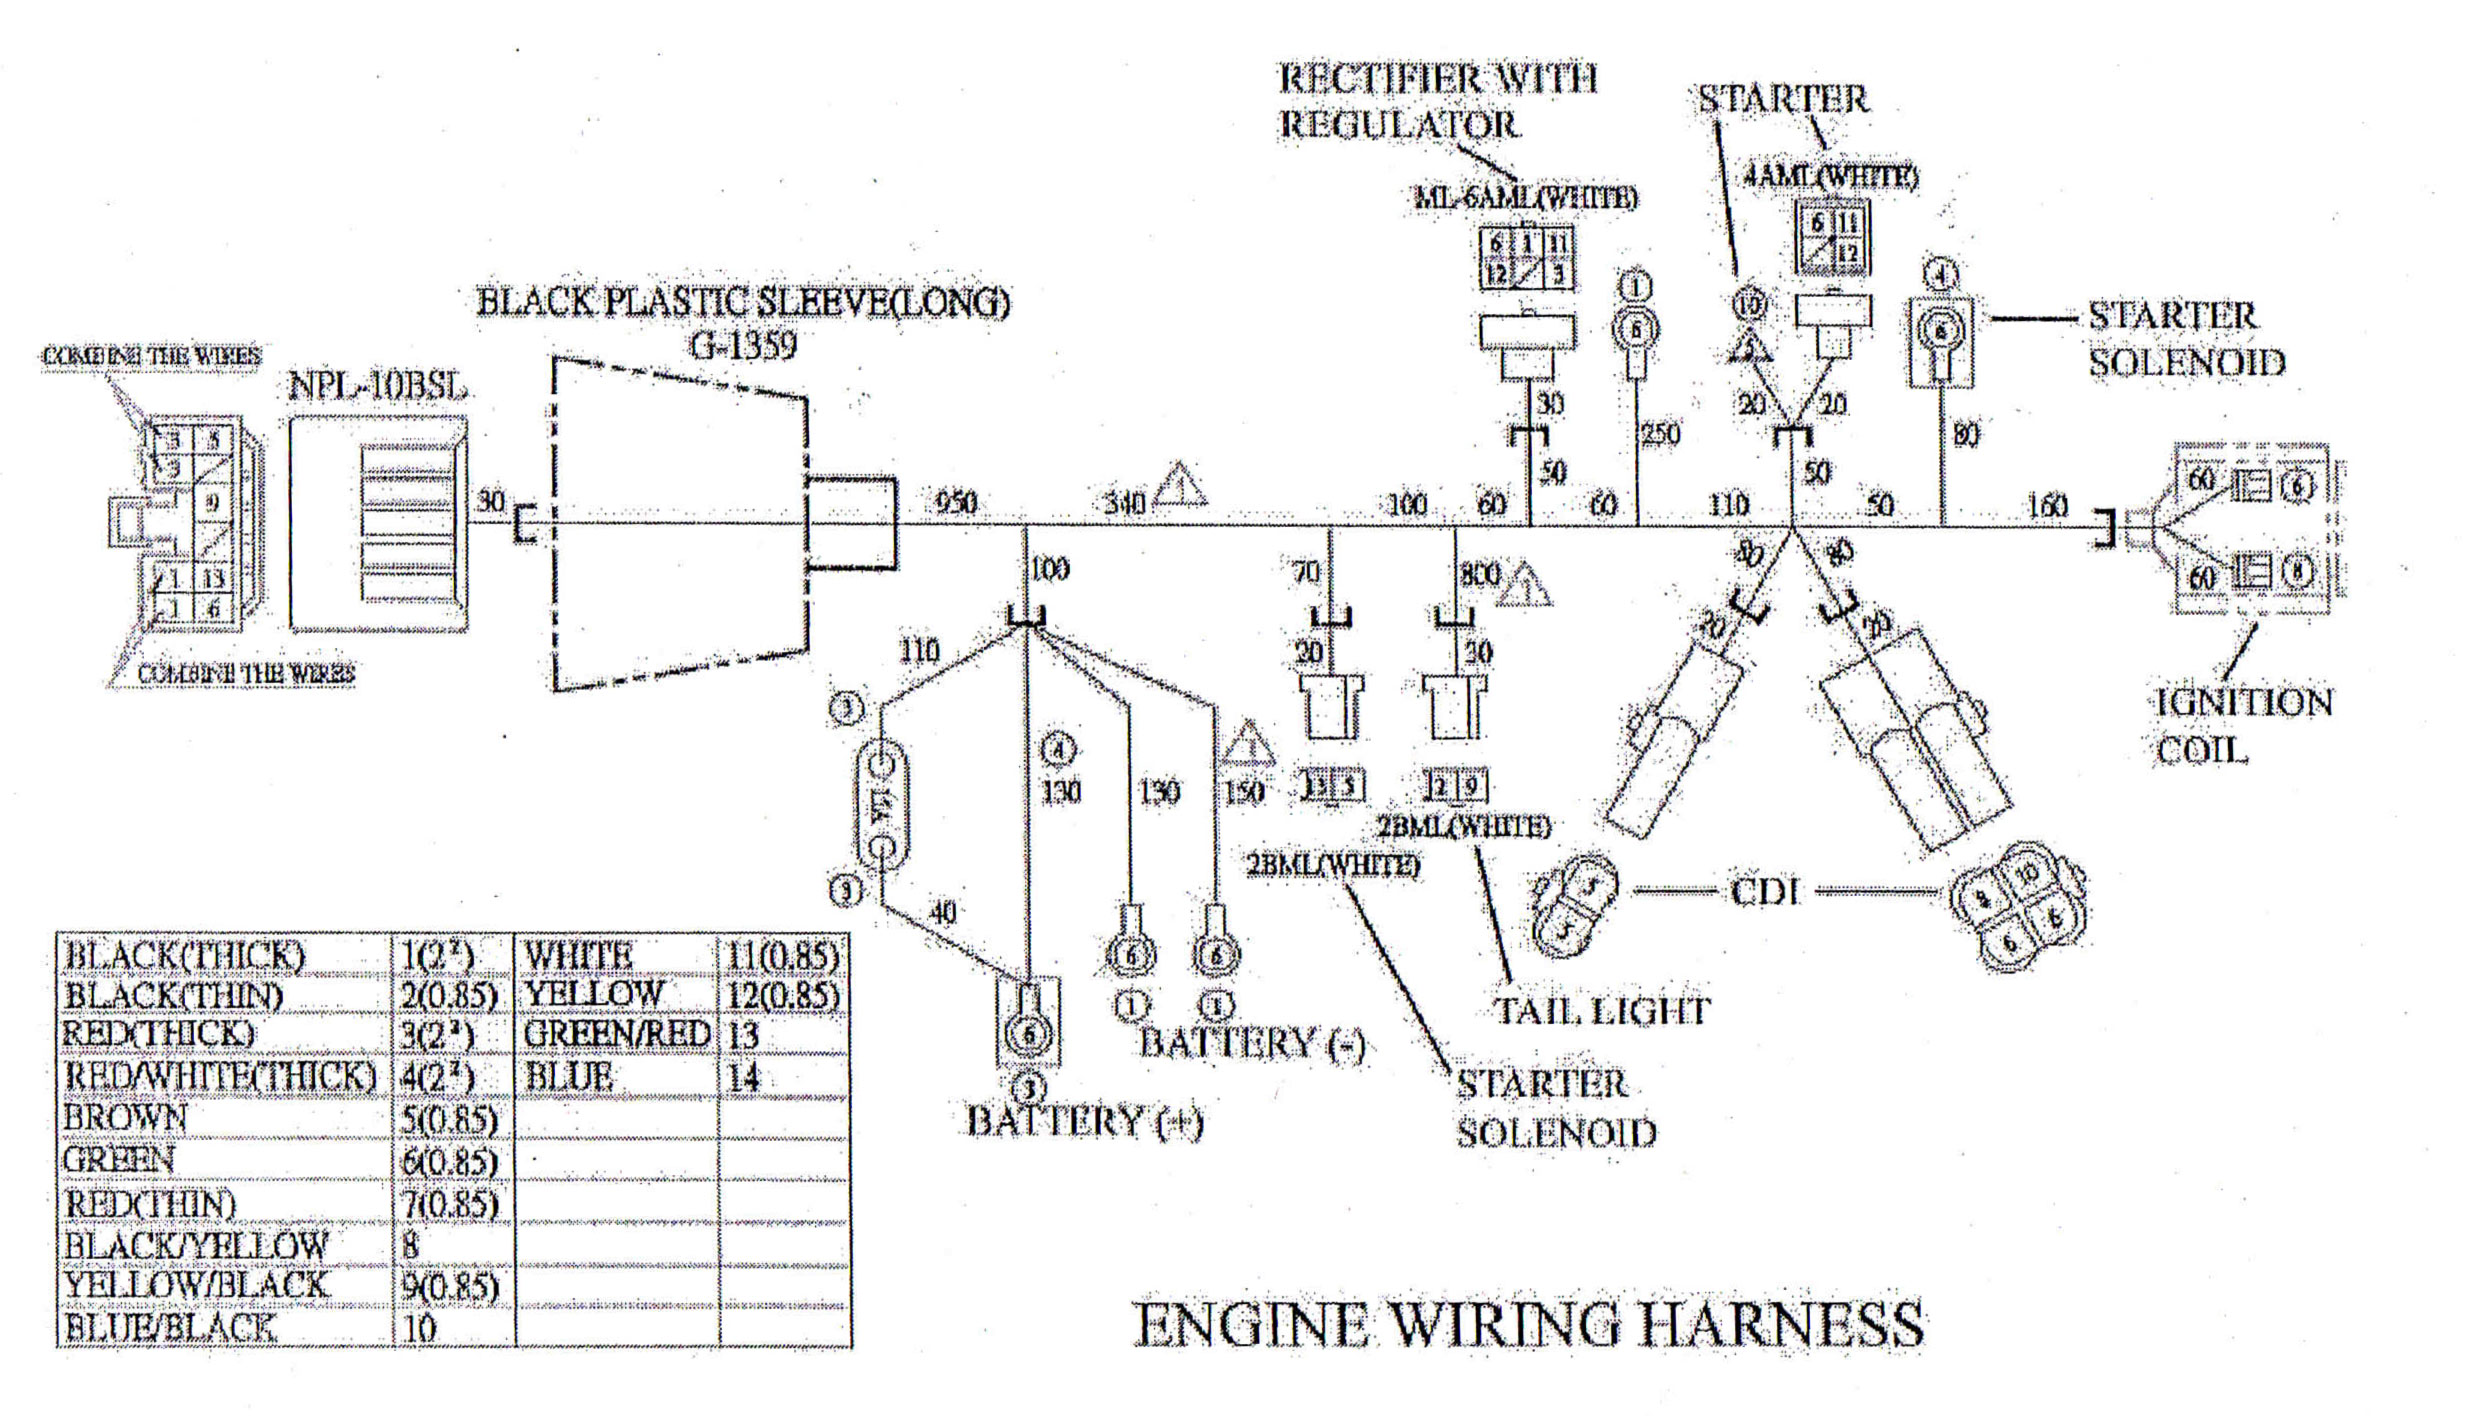 Vulcan 750 Wiring Diagram On Polaris Wiring Diagram Snowmobile